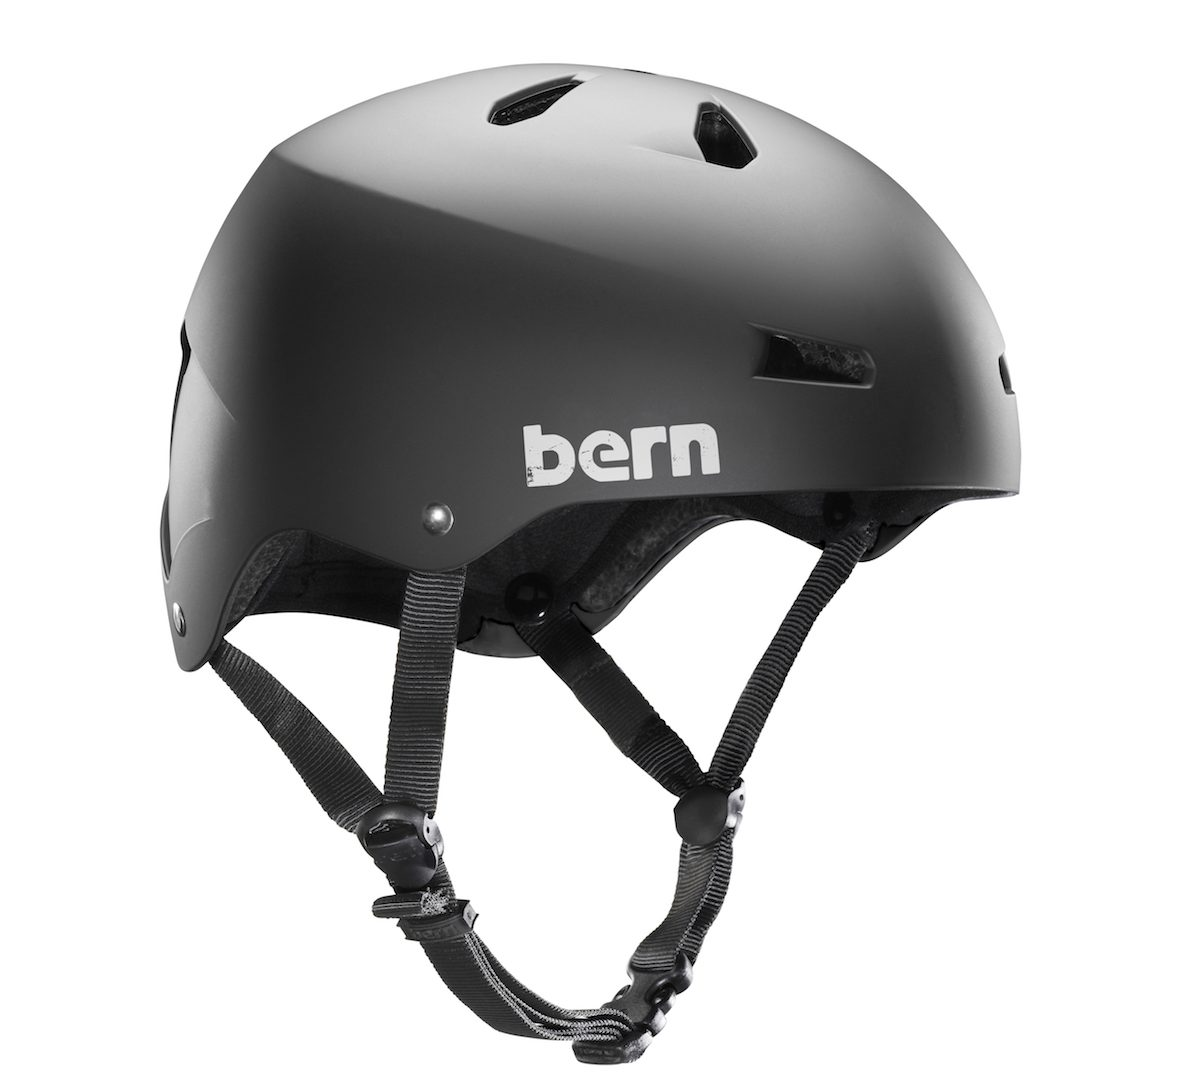 Bern Helmets SS20 Skate Helmet & Protection Preview